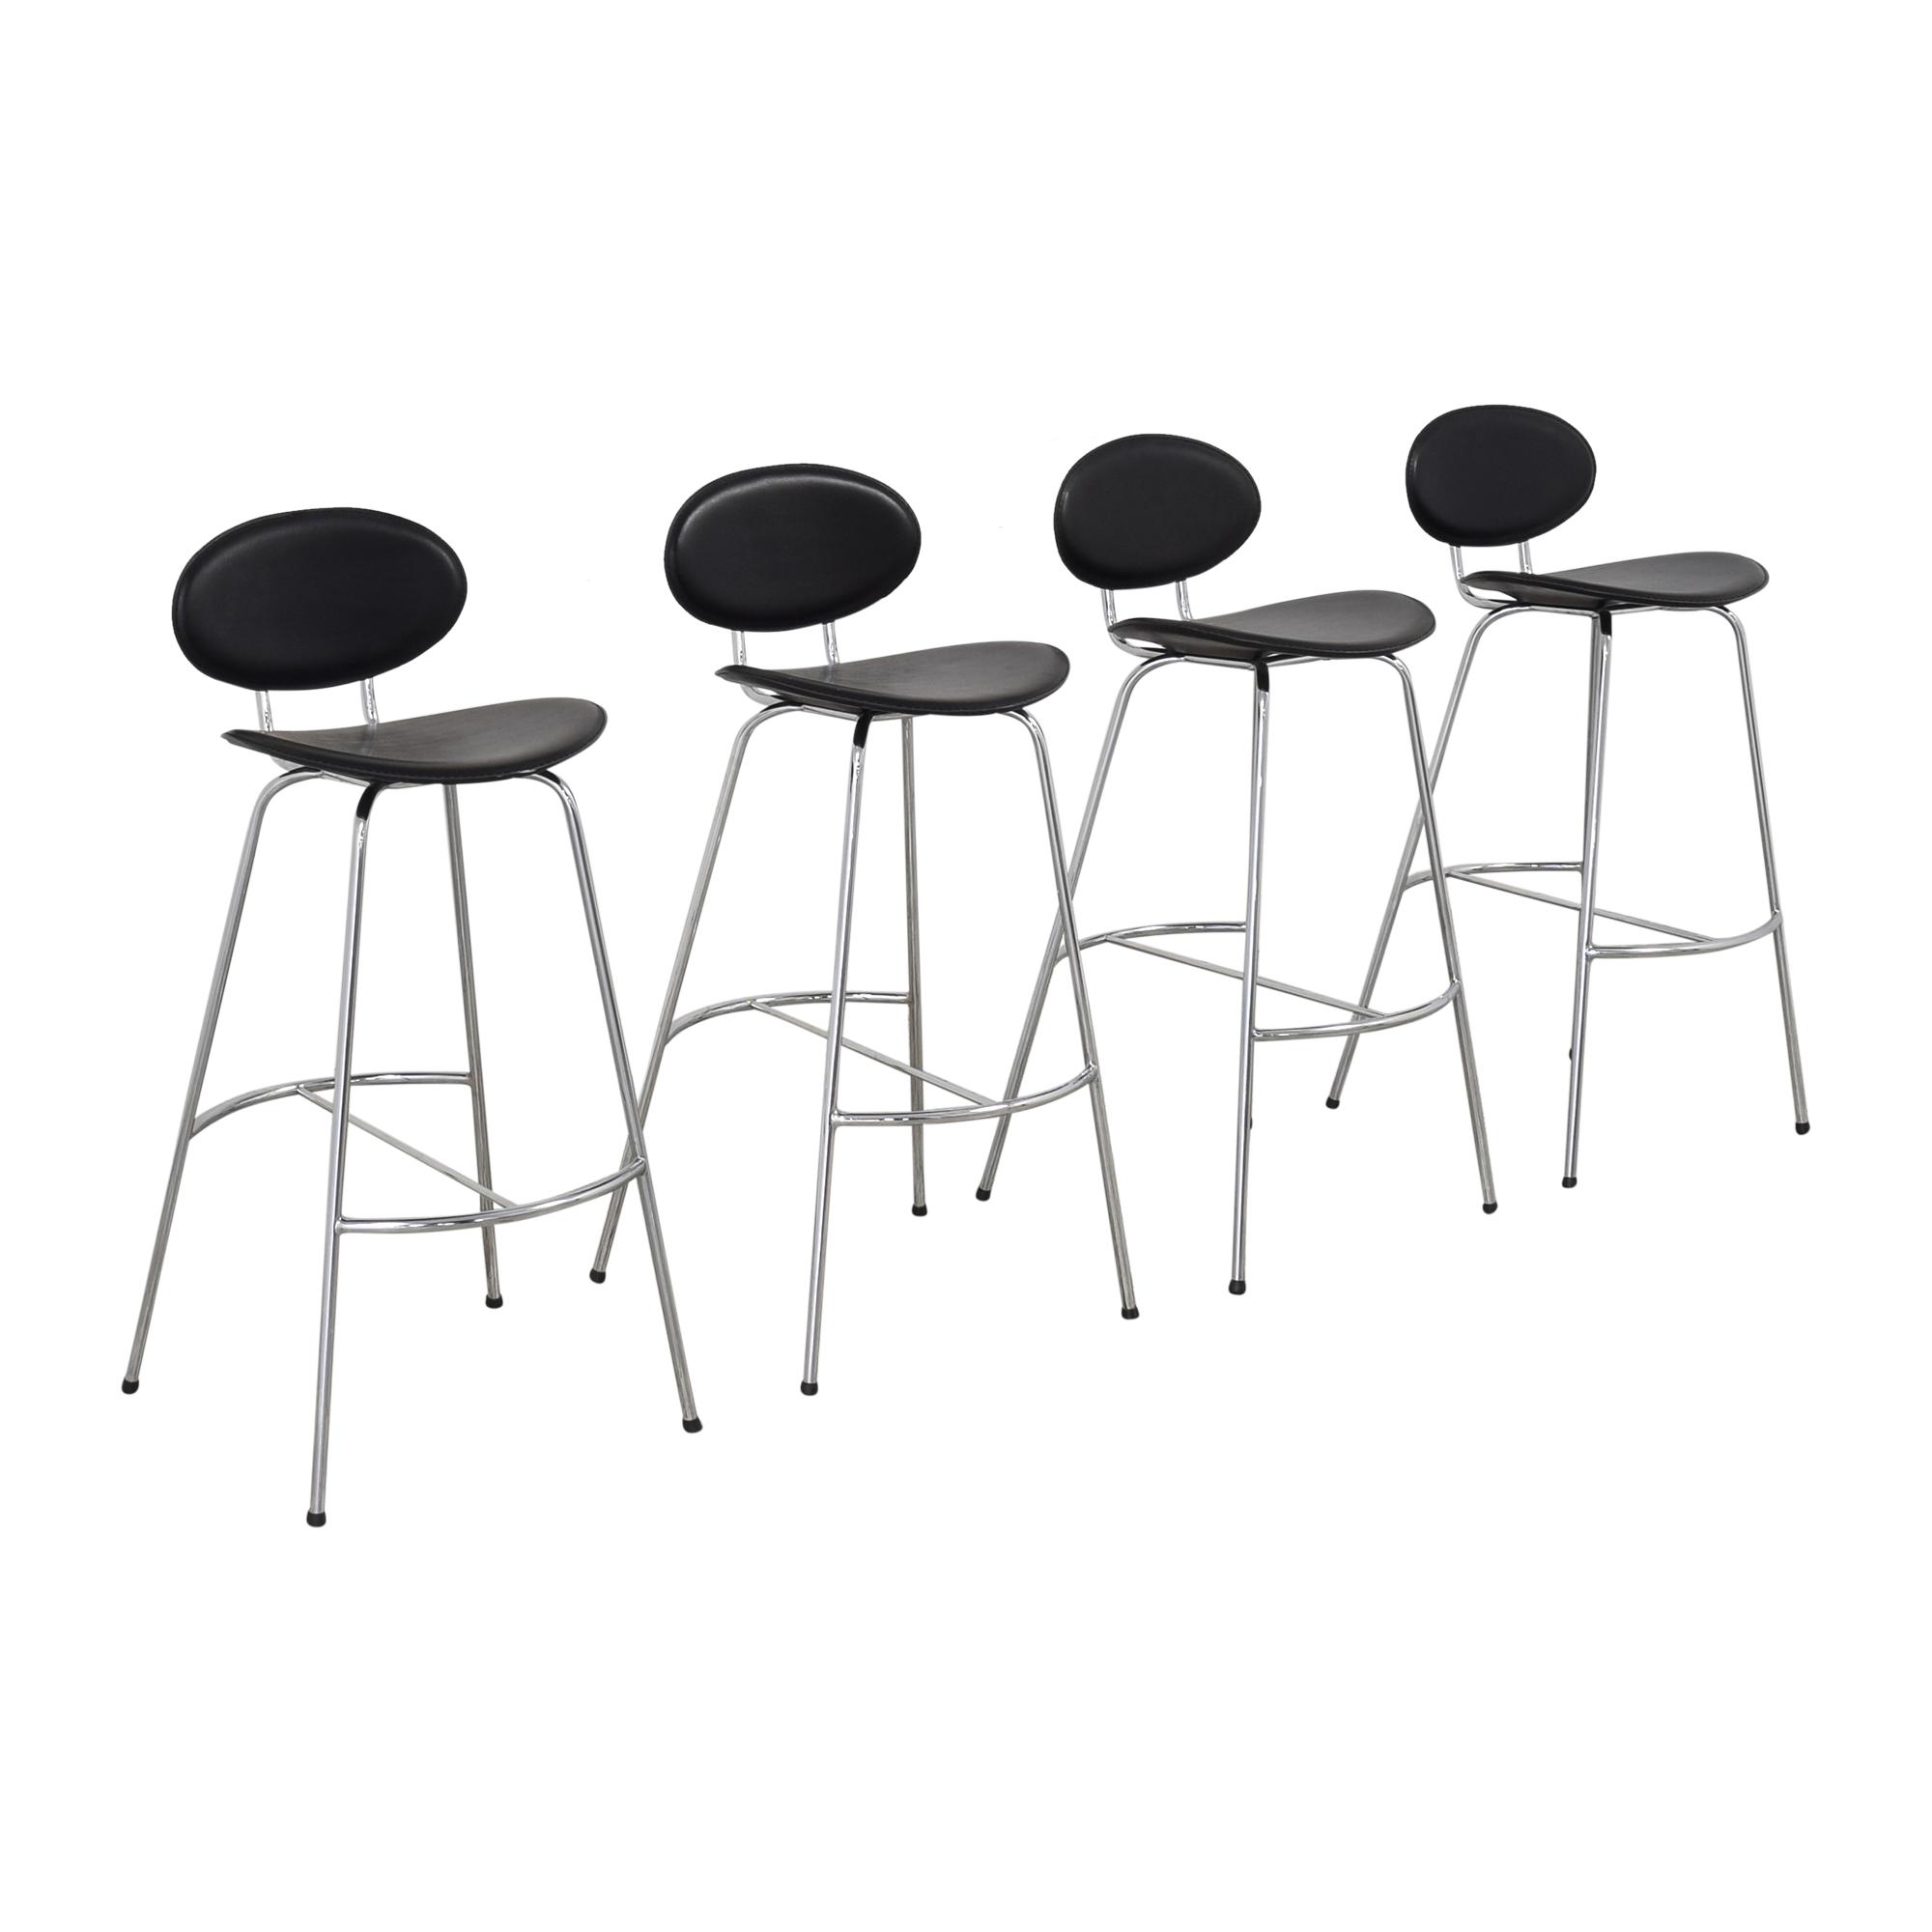 Room & Board Radius Bar Stools / Chairs